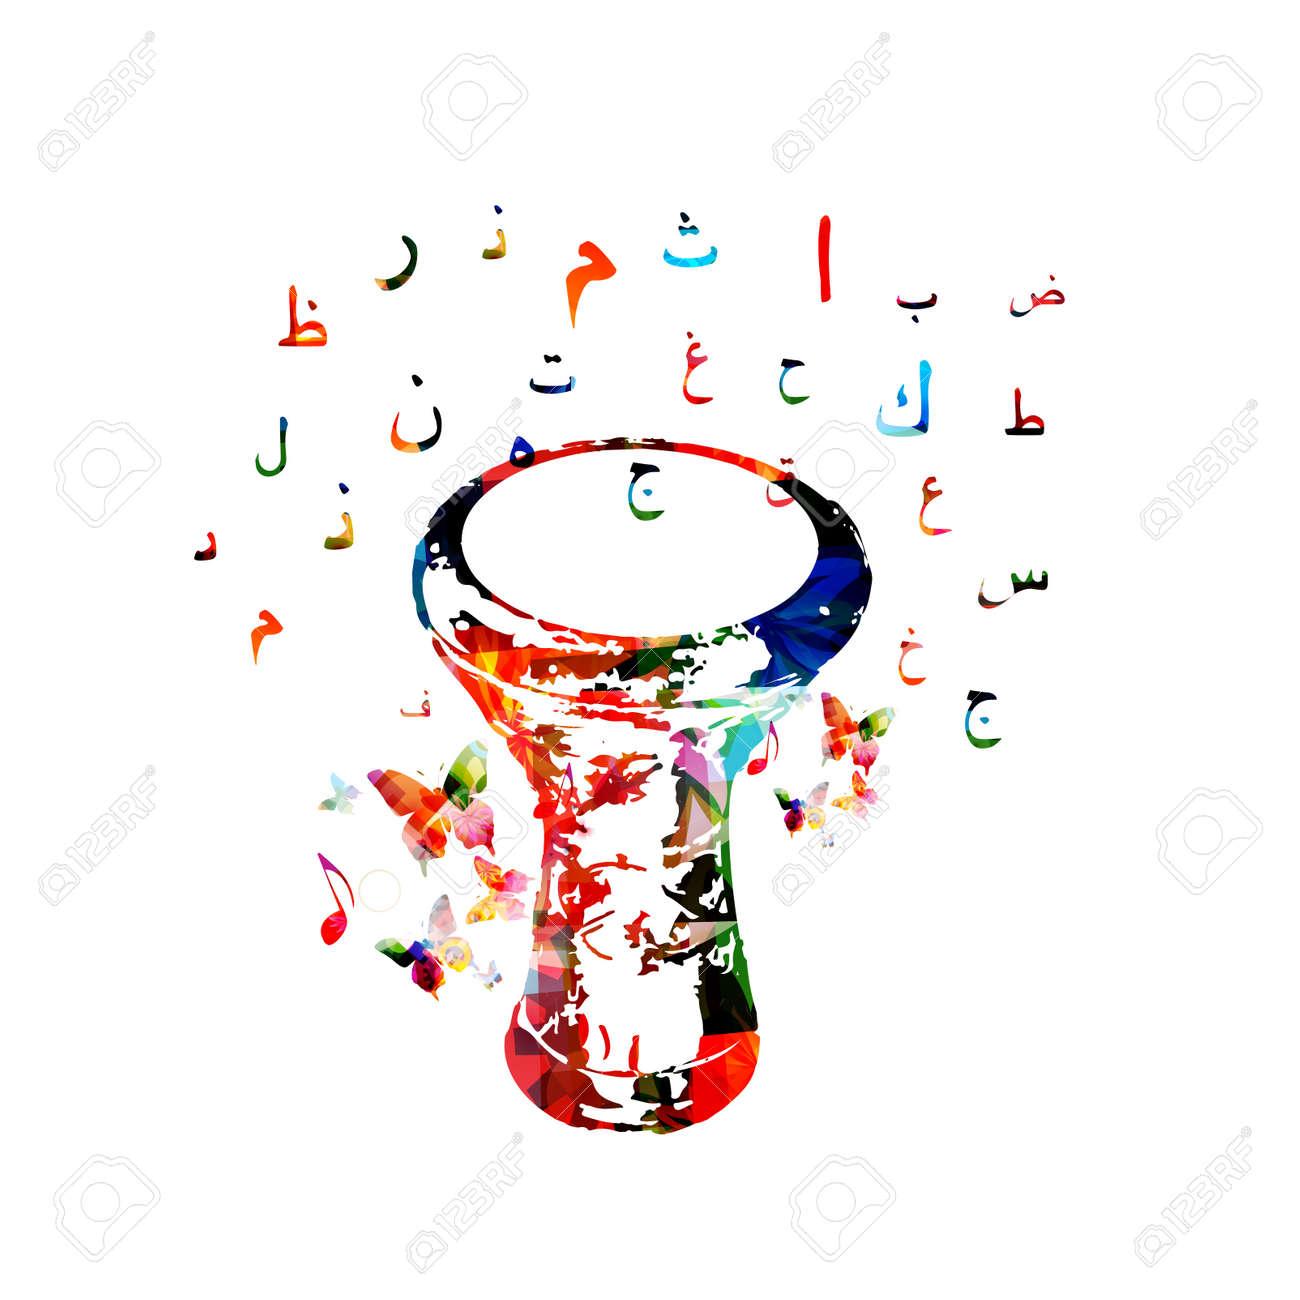 Colorful darbuka with arabic calligraphy symbols isolated vector colorful darbuka with arabic calligraphy symbols isolated vector illustration stock vector 69828619 biocorpaavc